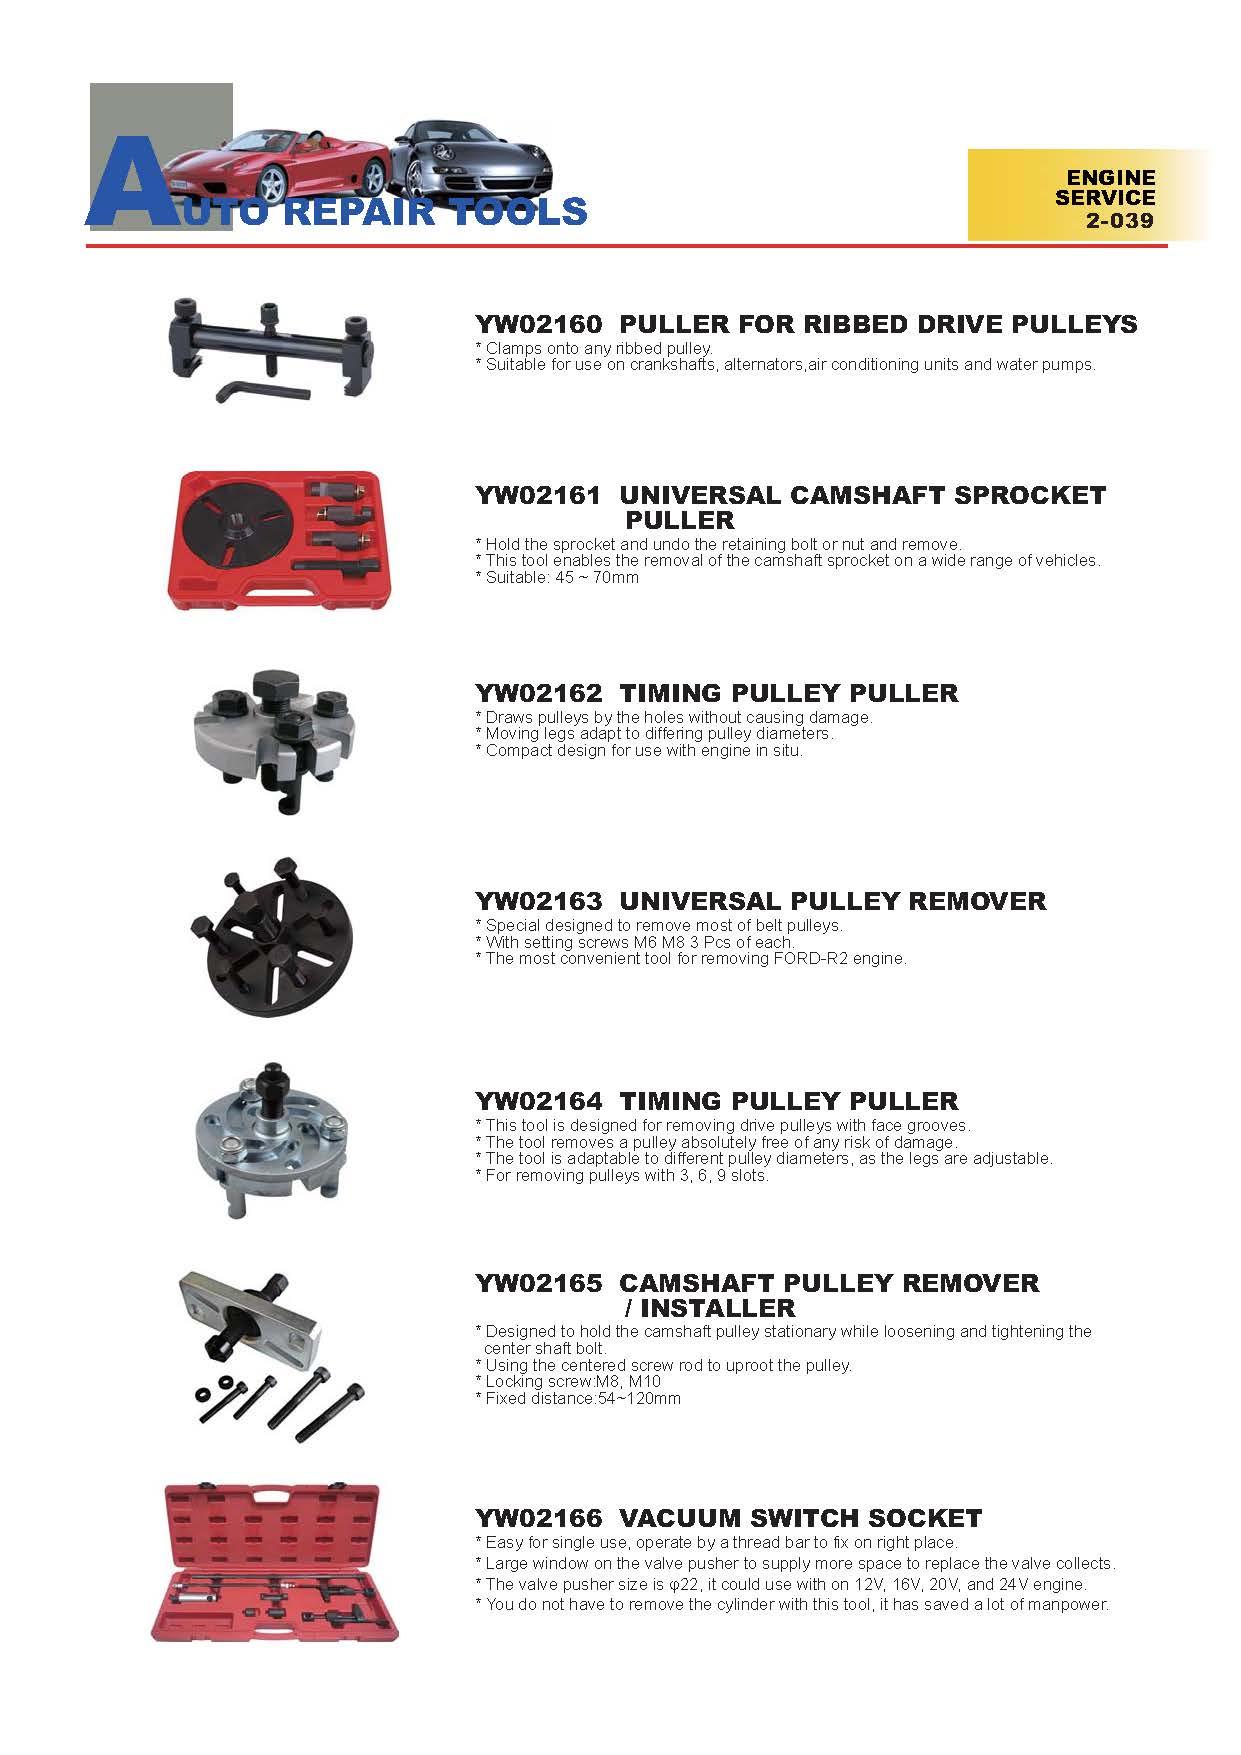 Years Way Auto Repair Tools - Engine Service Tools